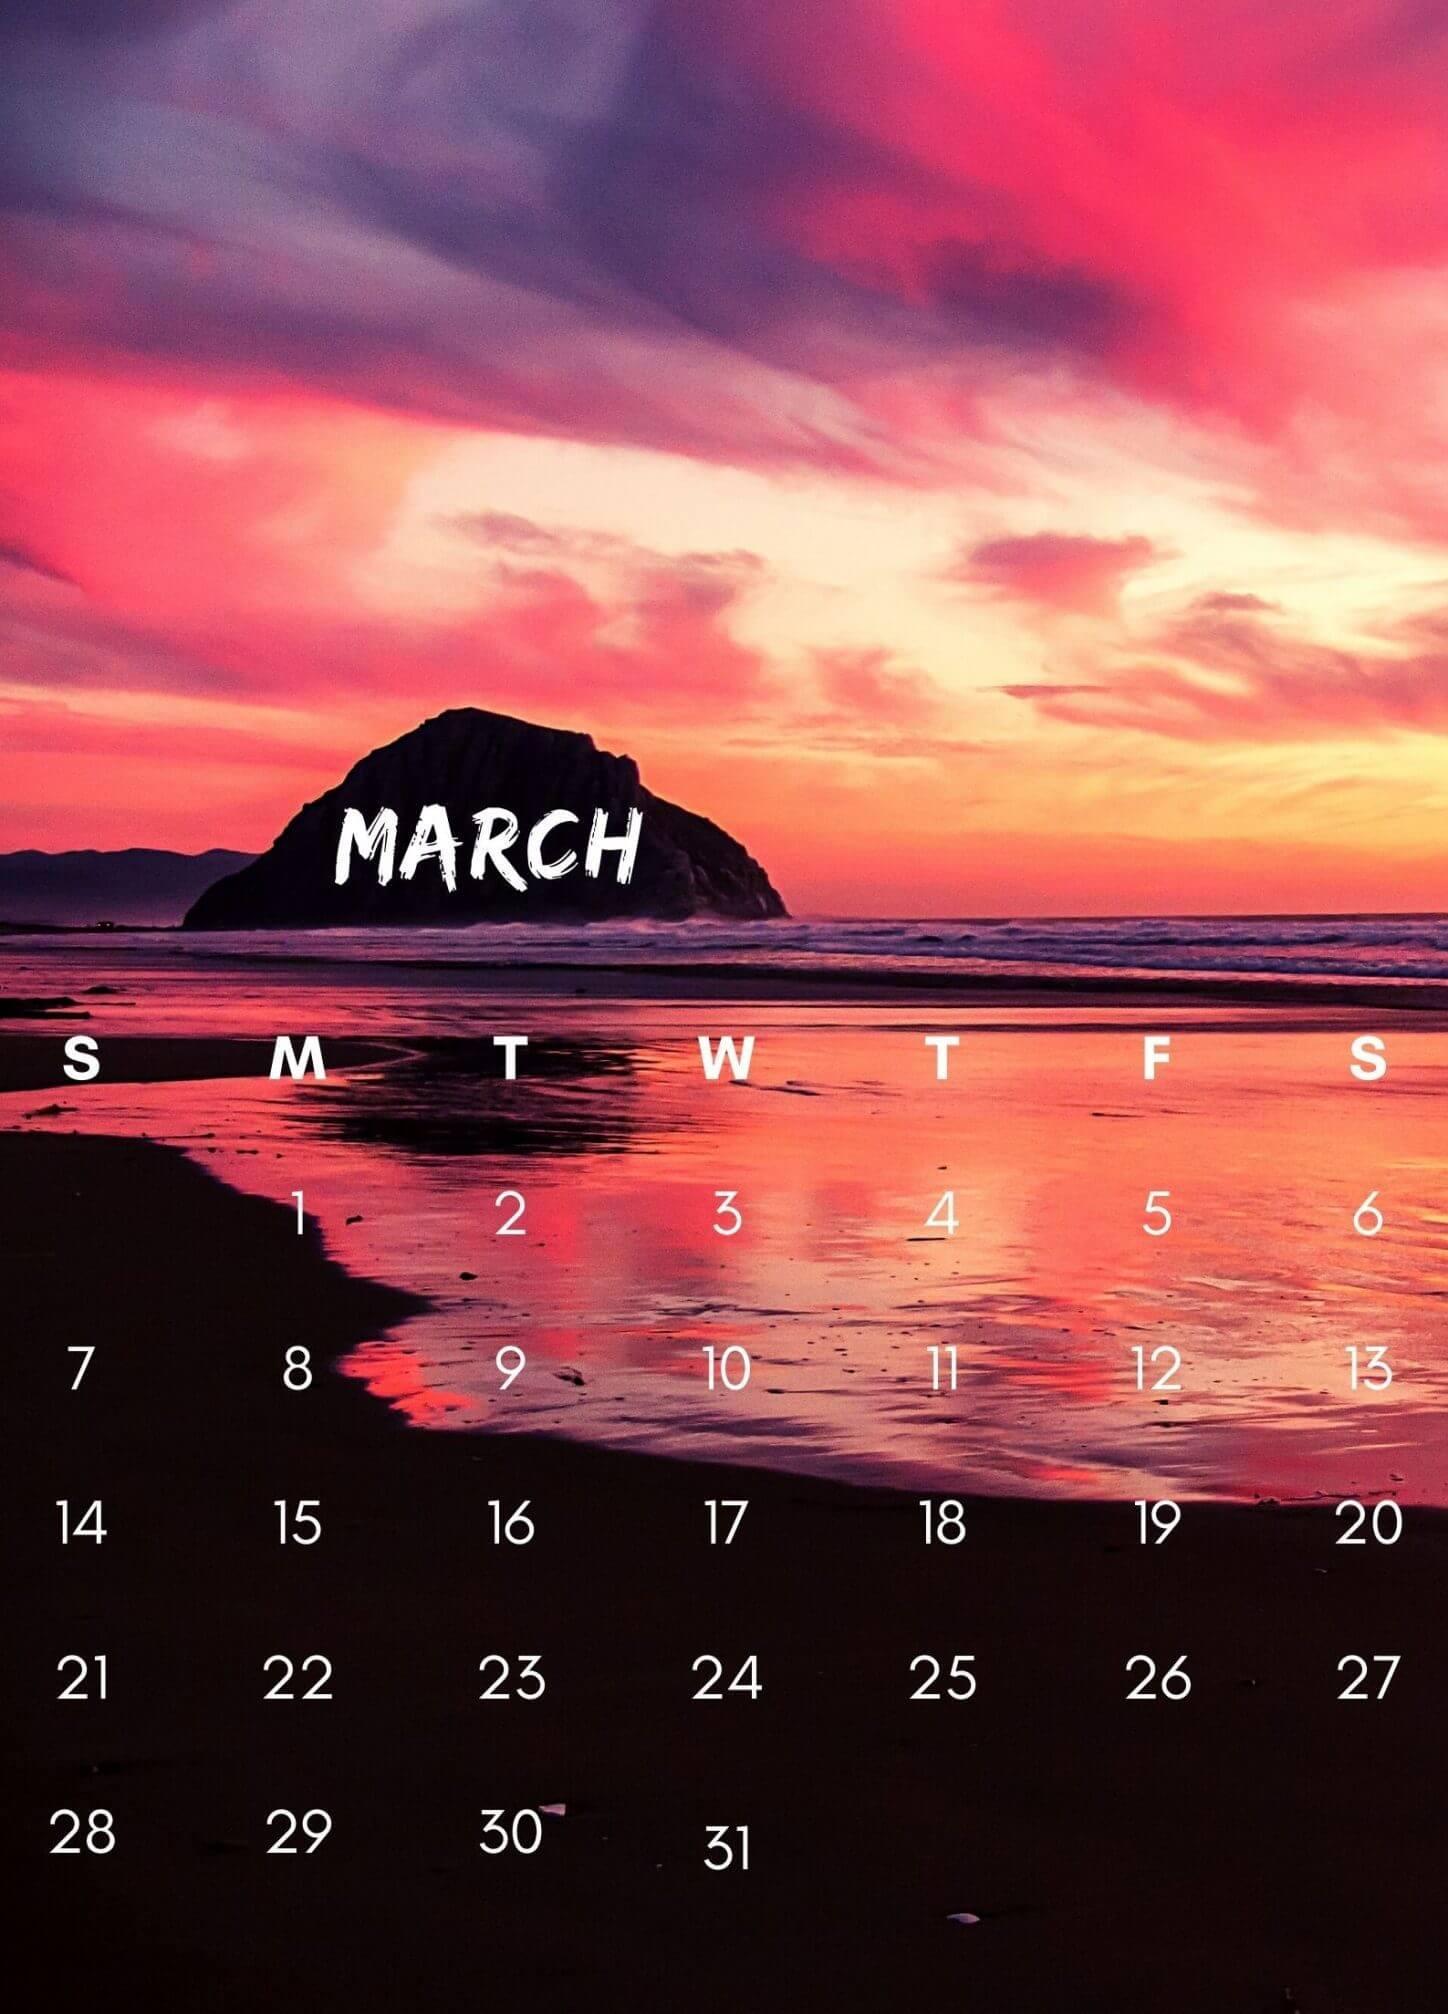 Cute March 2021 iPhone Calendar Wallpaper